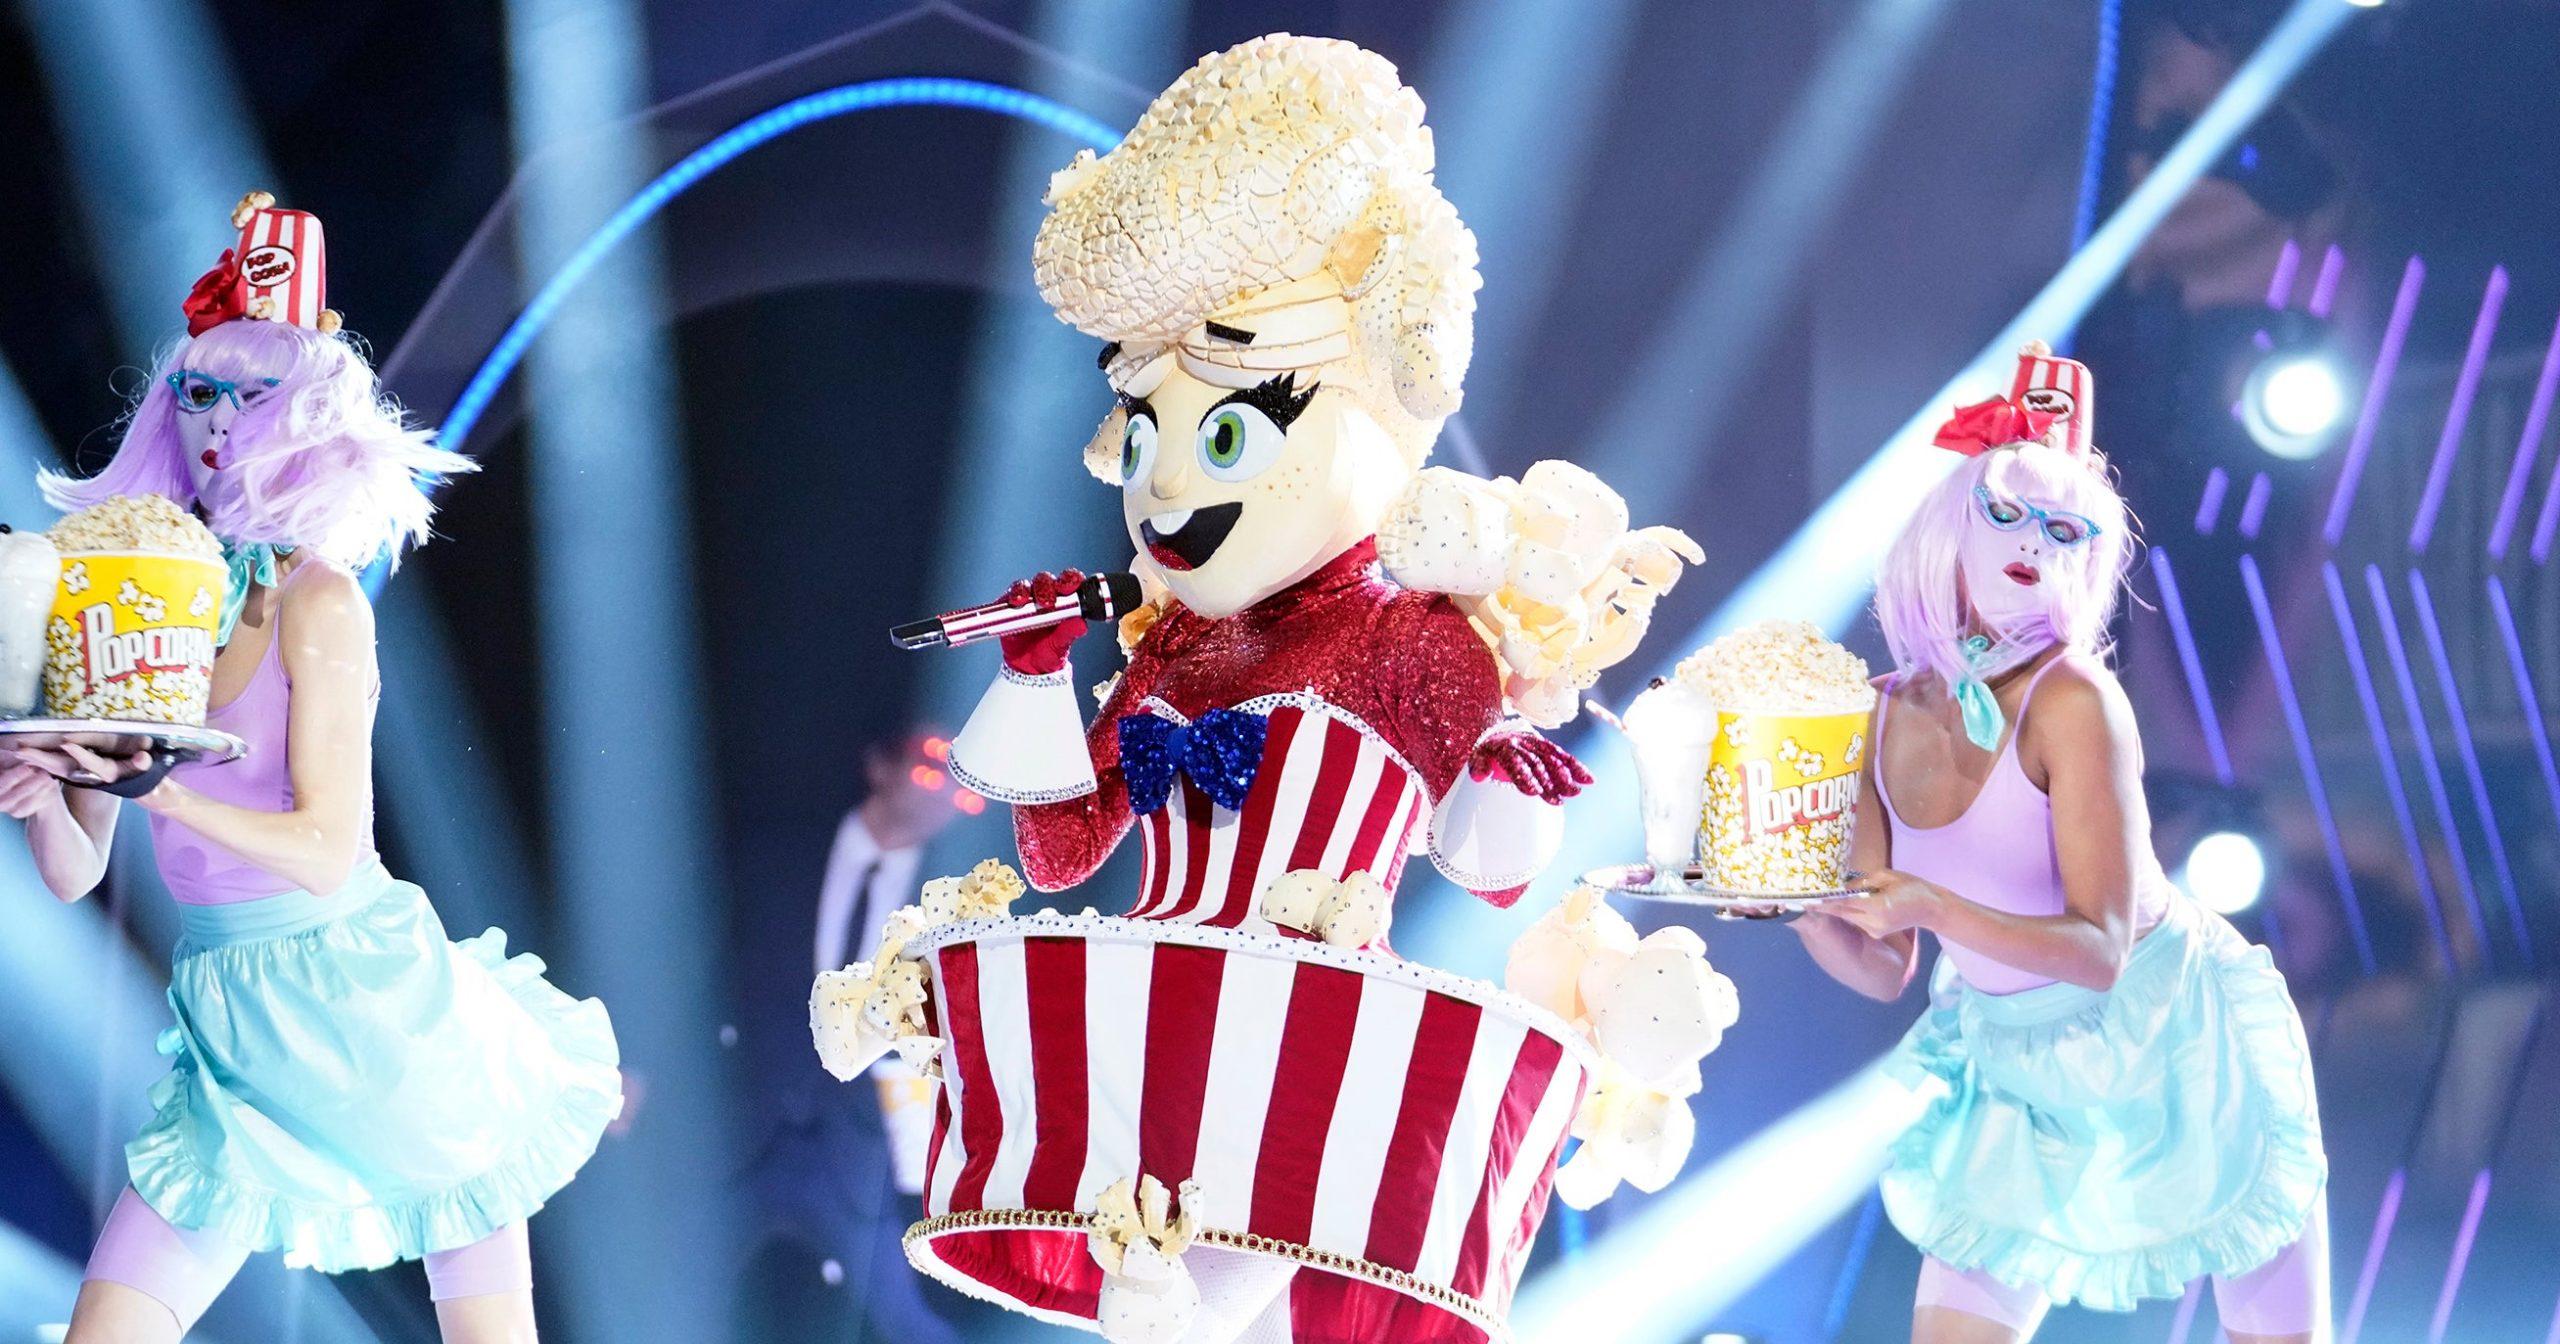 Popcorn - Taylor Dayne